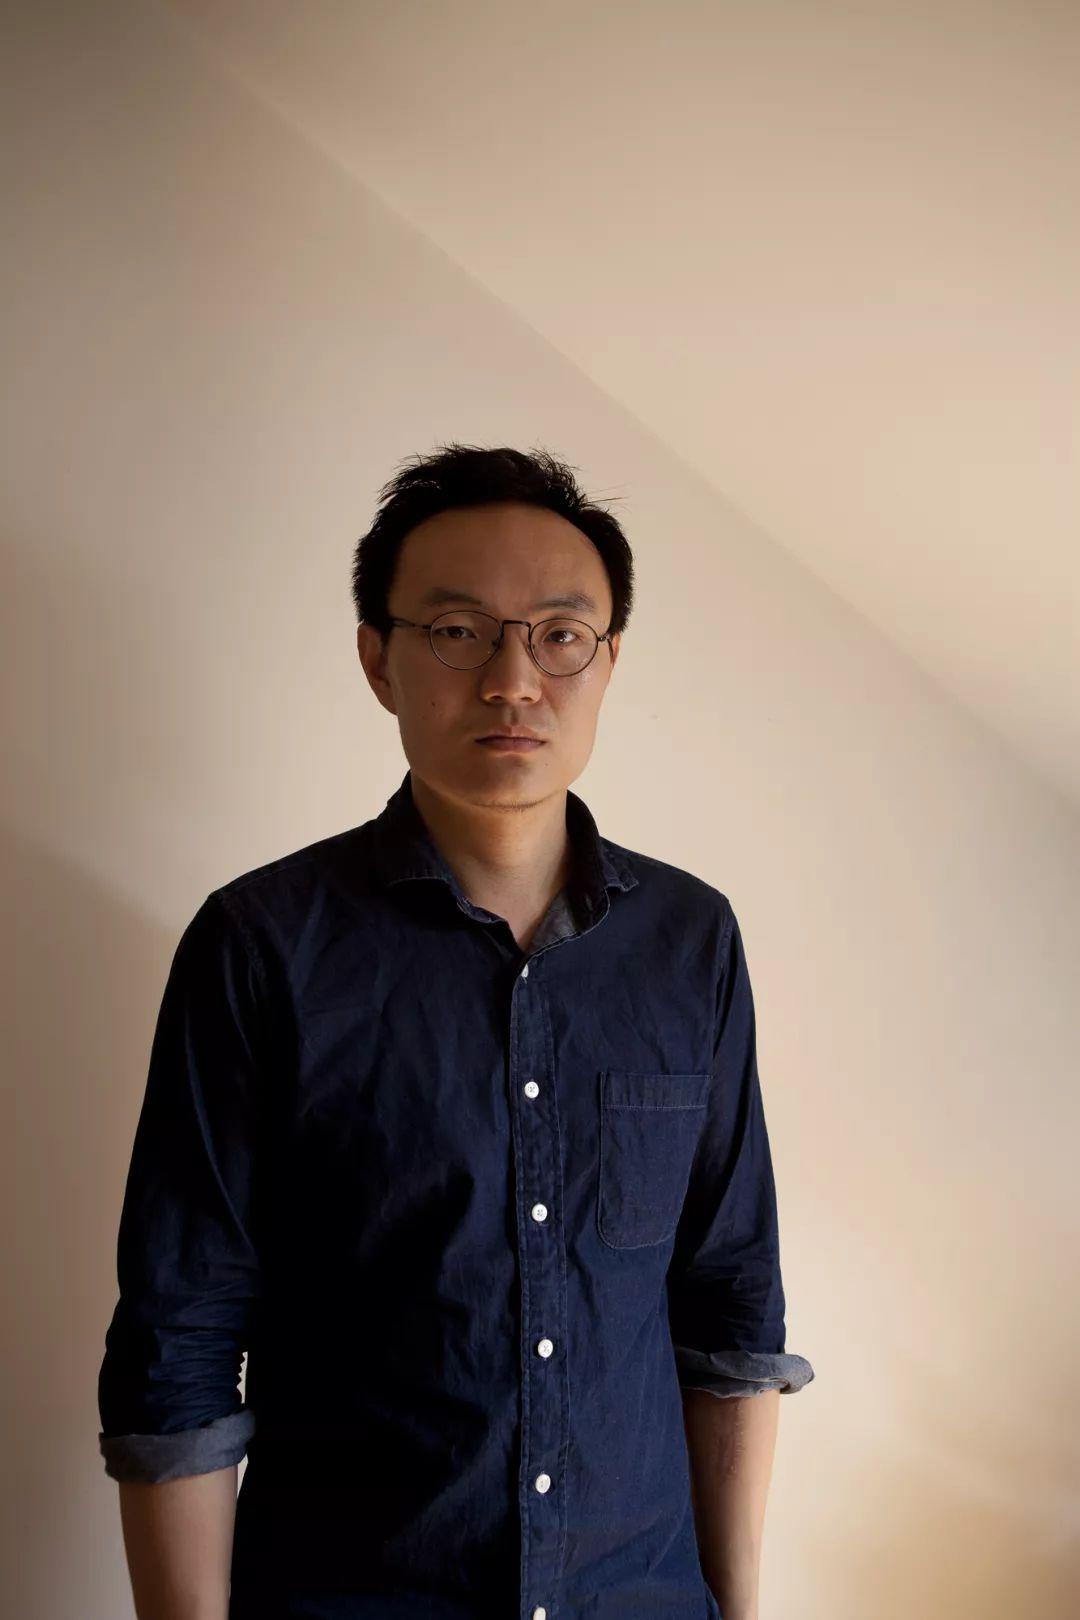 张之洲,1985年生于北京,先后在北京第二外国语学院,英国创意艺术大学学习并获得法学学士及摄影纯艺术硕士学位。现在是自由摄影师、艺术家,并同时进行写作实践。作品主要关注摄影的语言与观看的经验之间复杂的关系。     Zhang Zhizhou (b.1985, Beijing, China) was graduated from Beijing International Studies University(BA in Law) and University for the Creative Arts in Rochester UK (MA in Photography). He currently works as freelance photographer, artist and writer. His recent work focuses on the complex relationship of the languages of photography and the experiences of seeing.